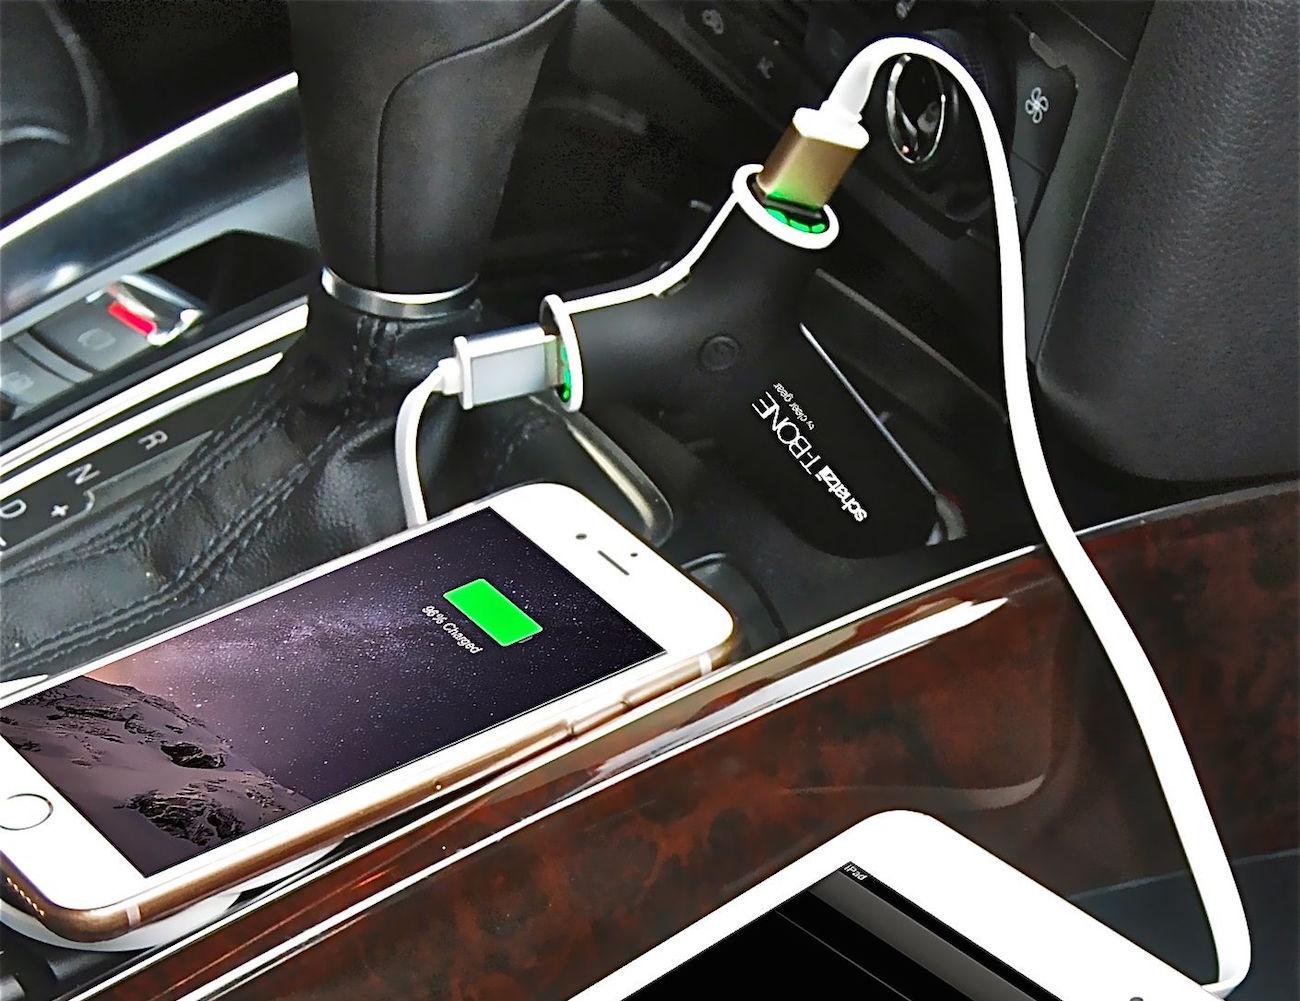 T-BONE+3+In+1+Car+Charger+%2B+Power+Bank+%2B+LED+Torch+Flashlight